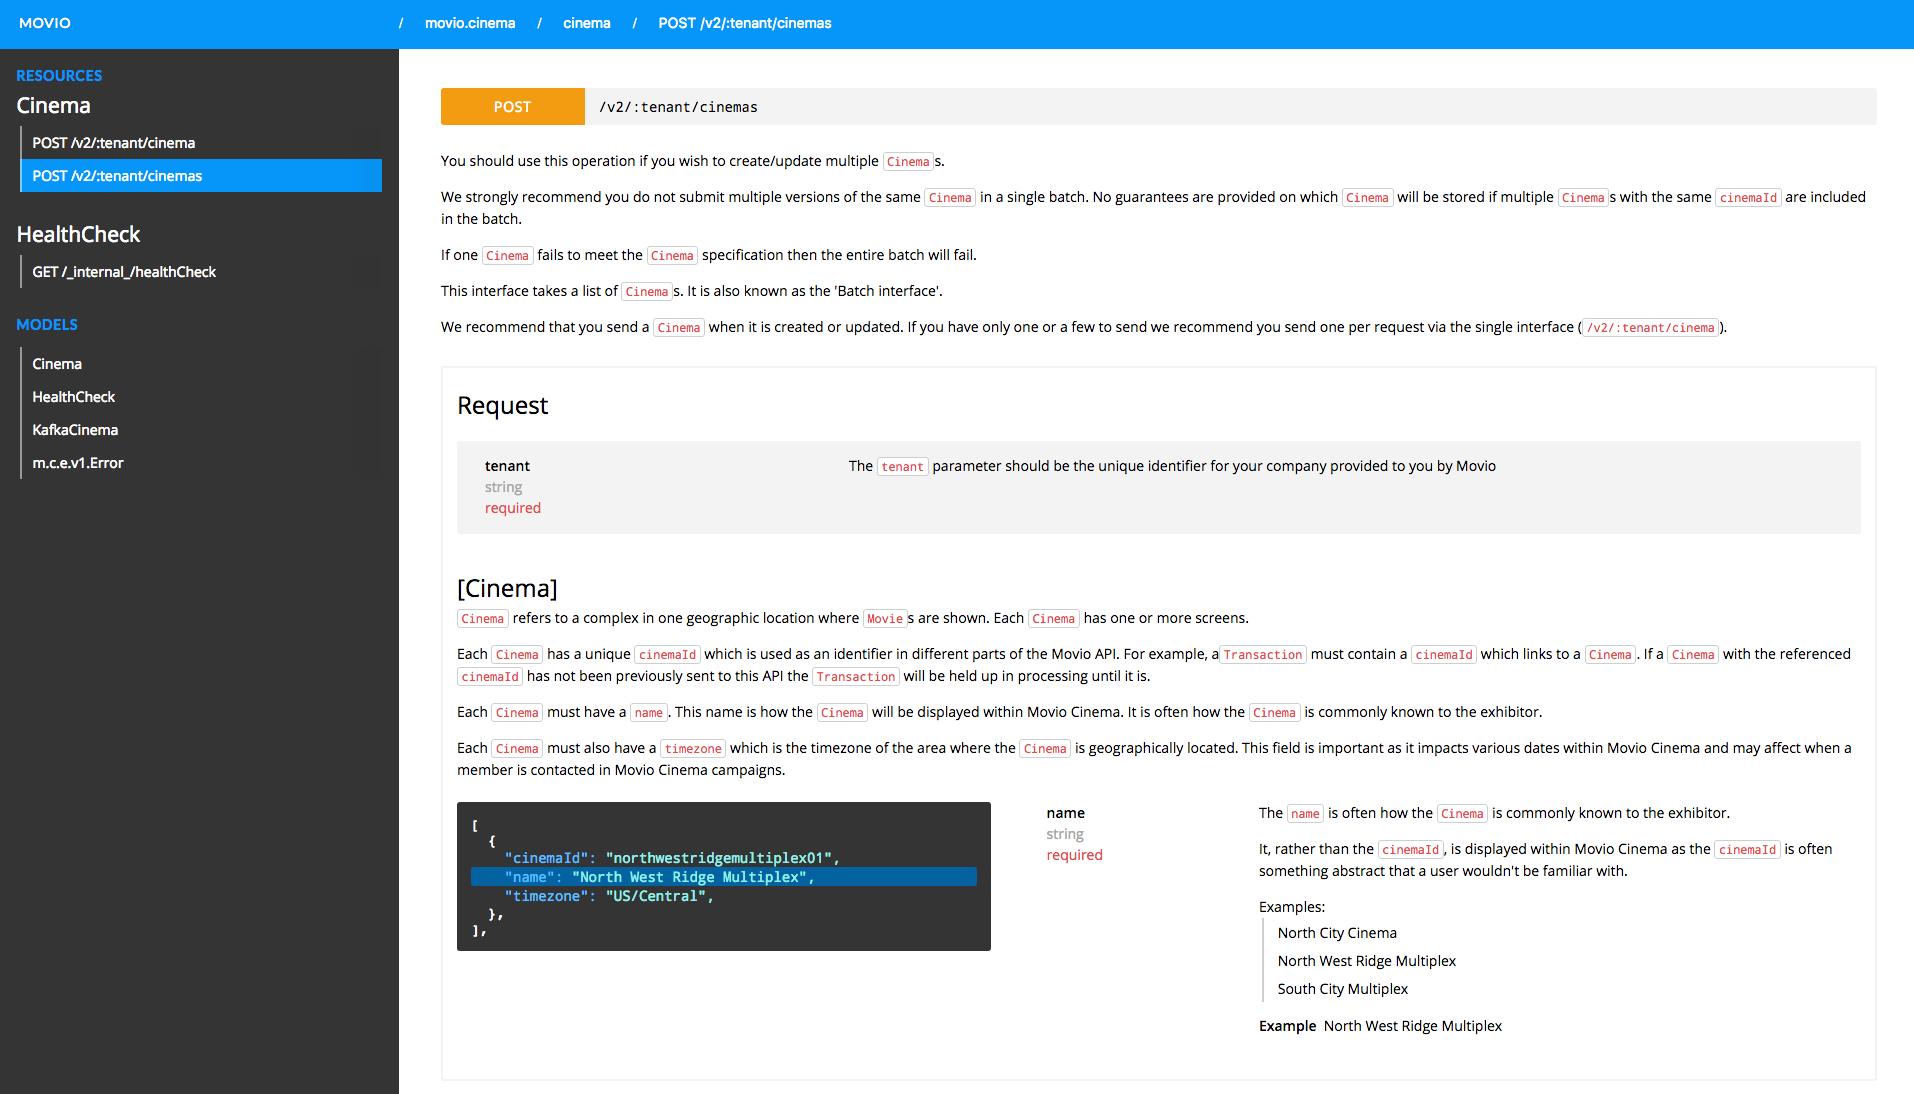 APIDOC-UI-resource